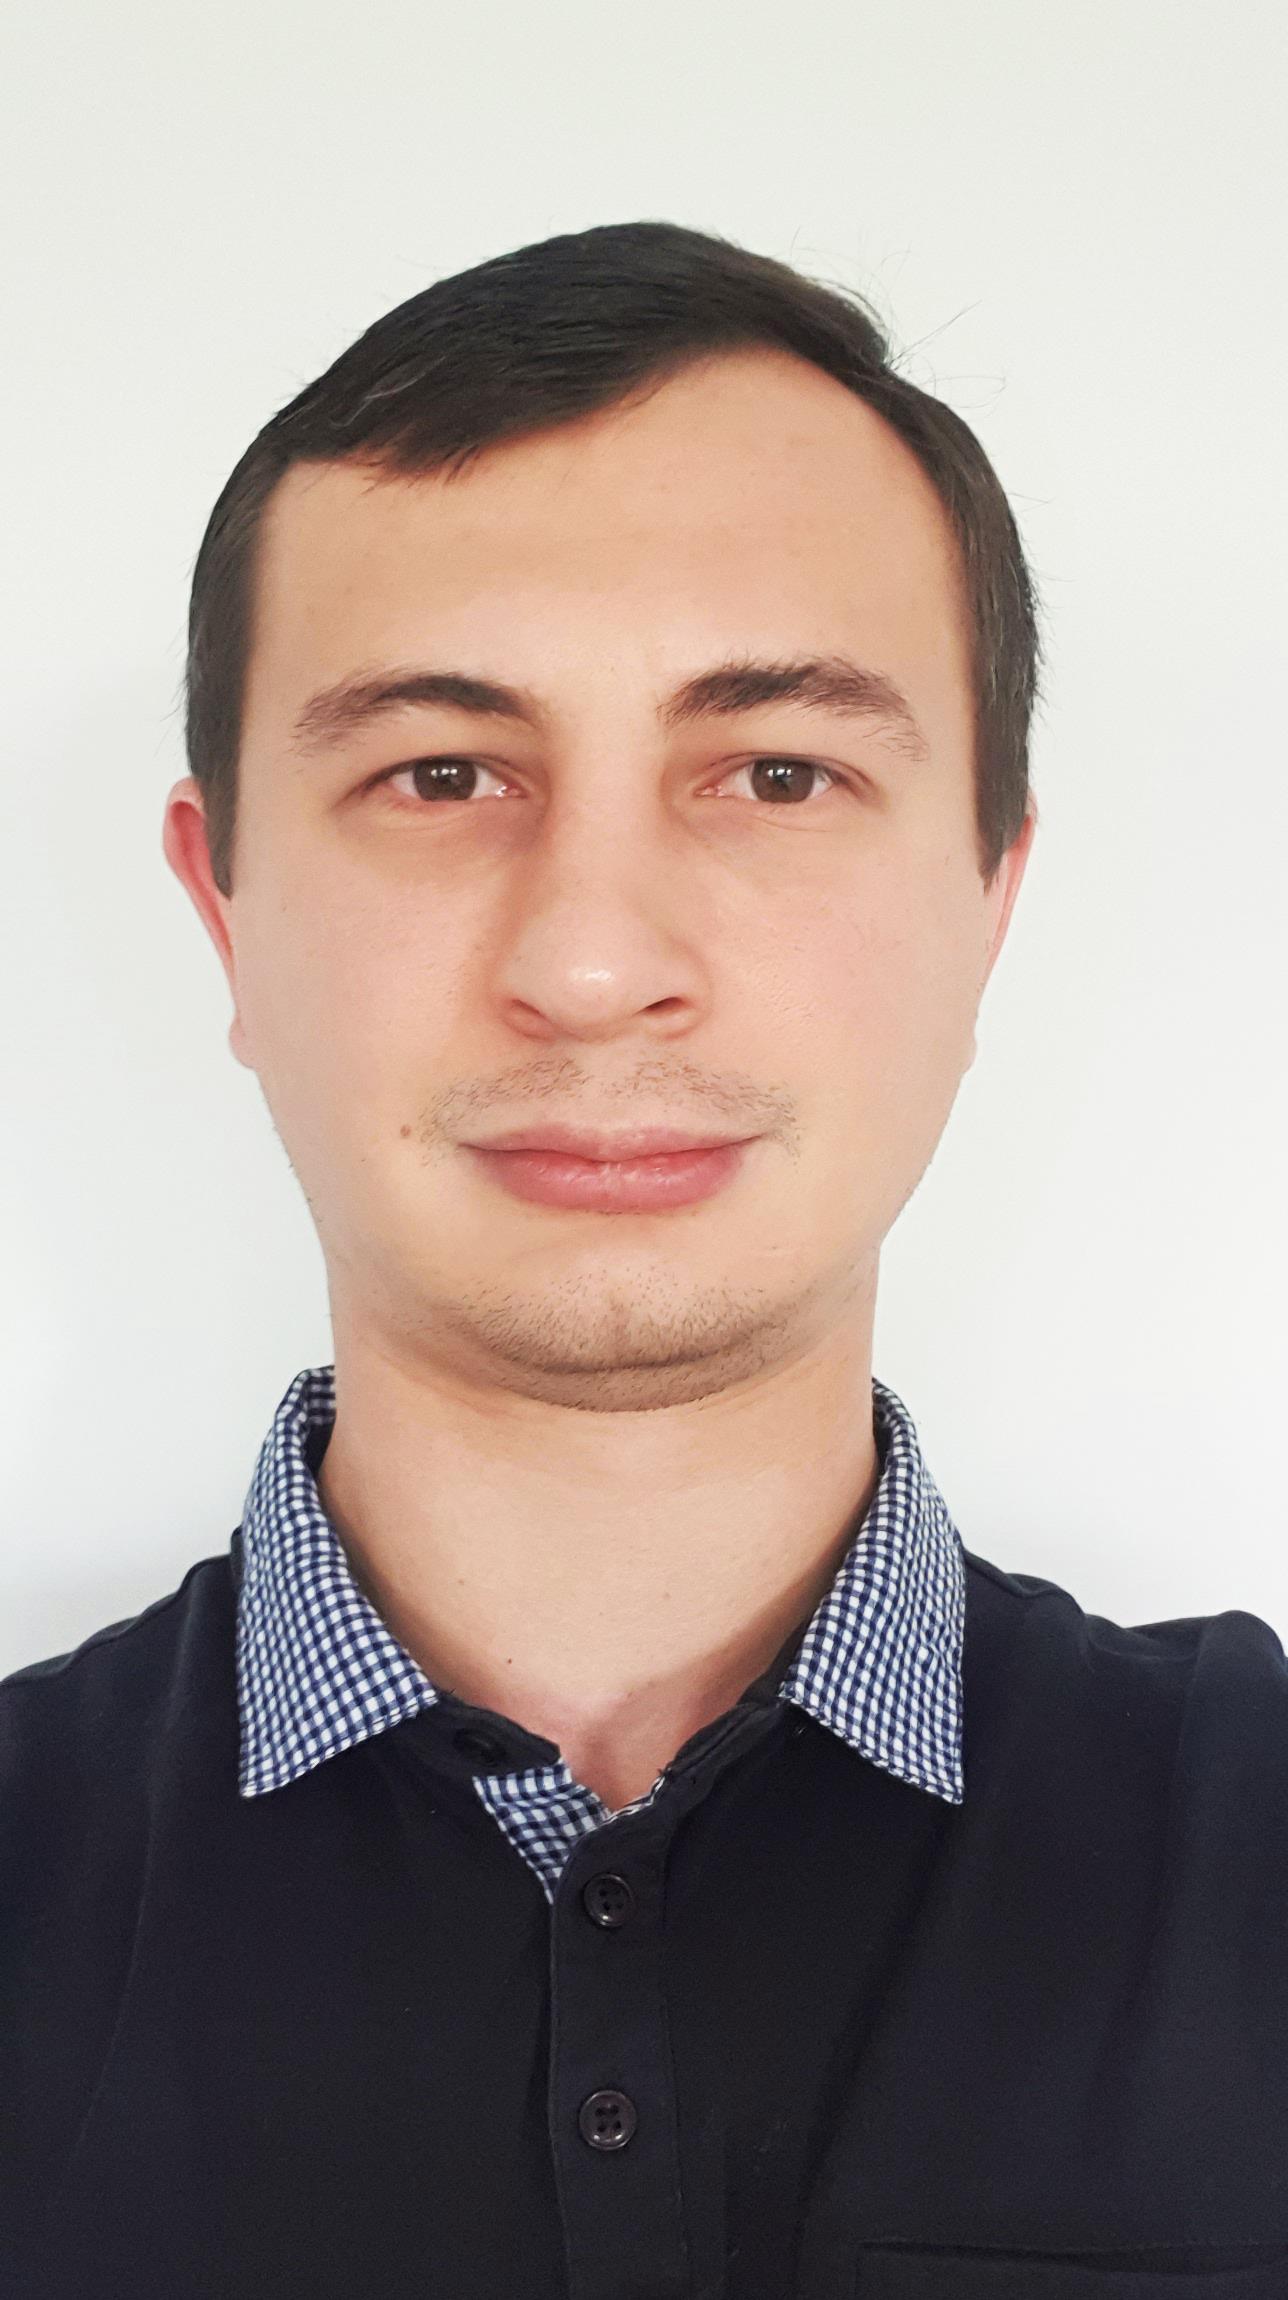 Шкуркин Дмитрий Владимирович